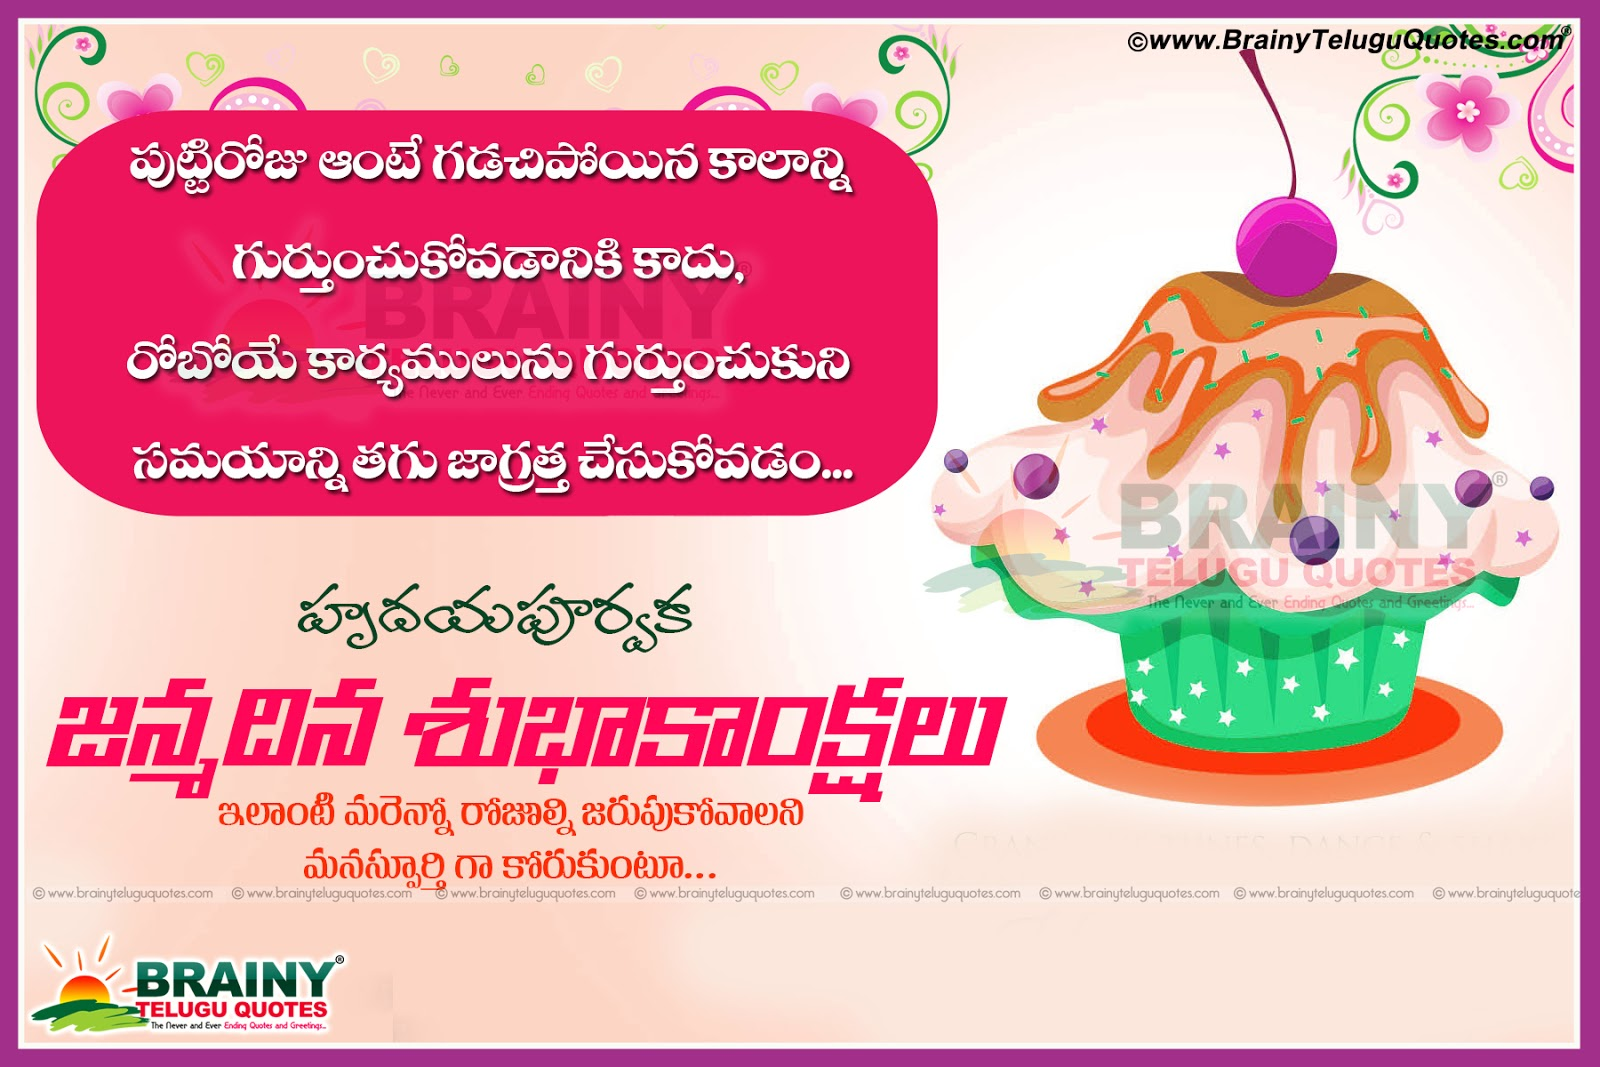 Happy Birthday Wishes in Telugu with nice Quotations – Telugu Birthday Greetings